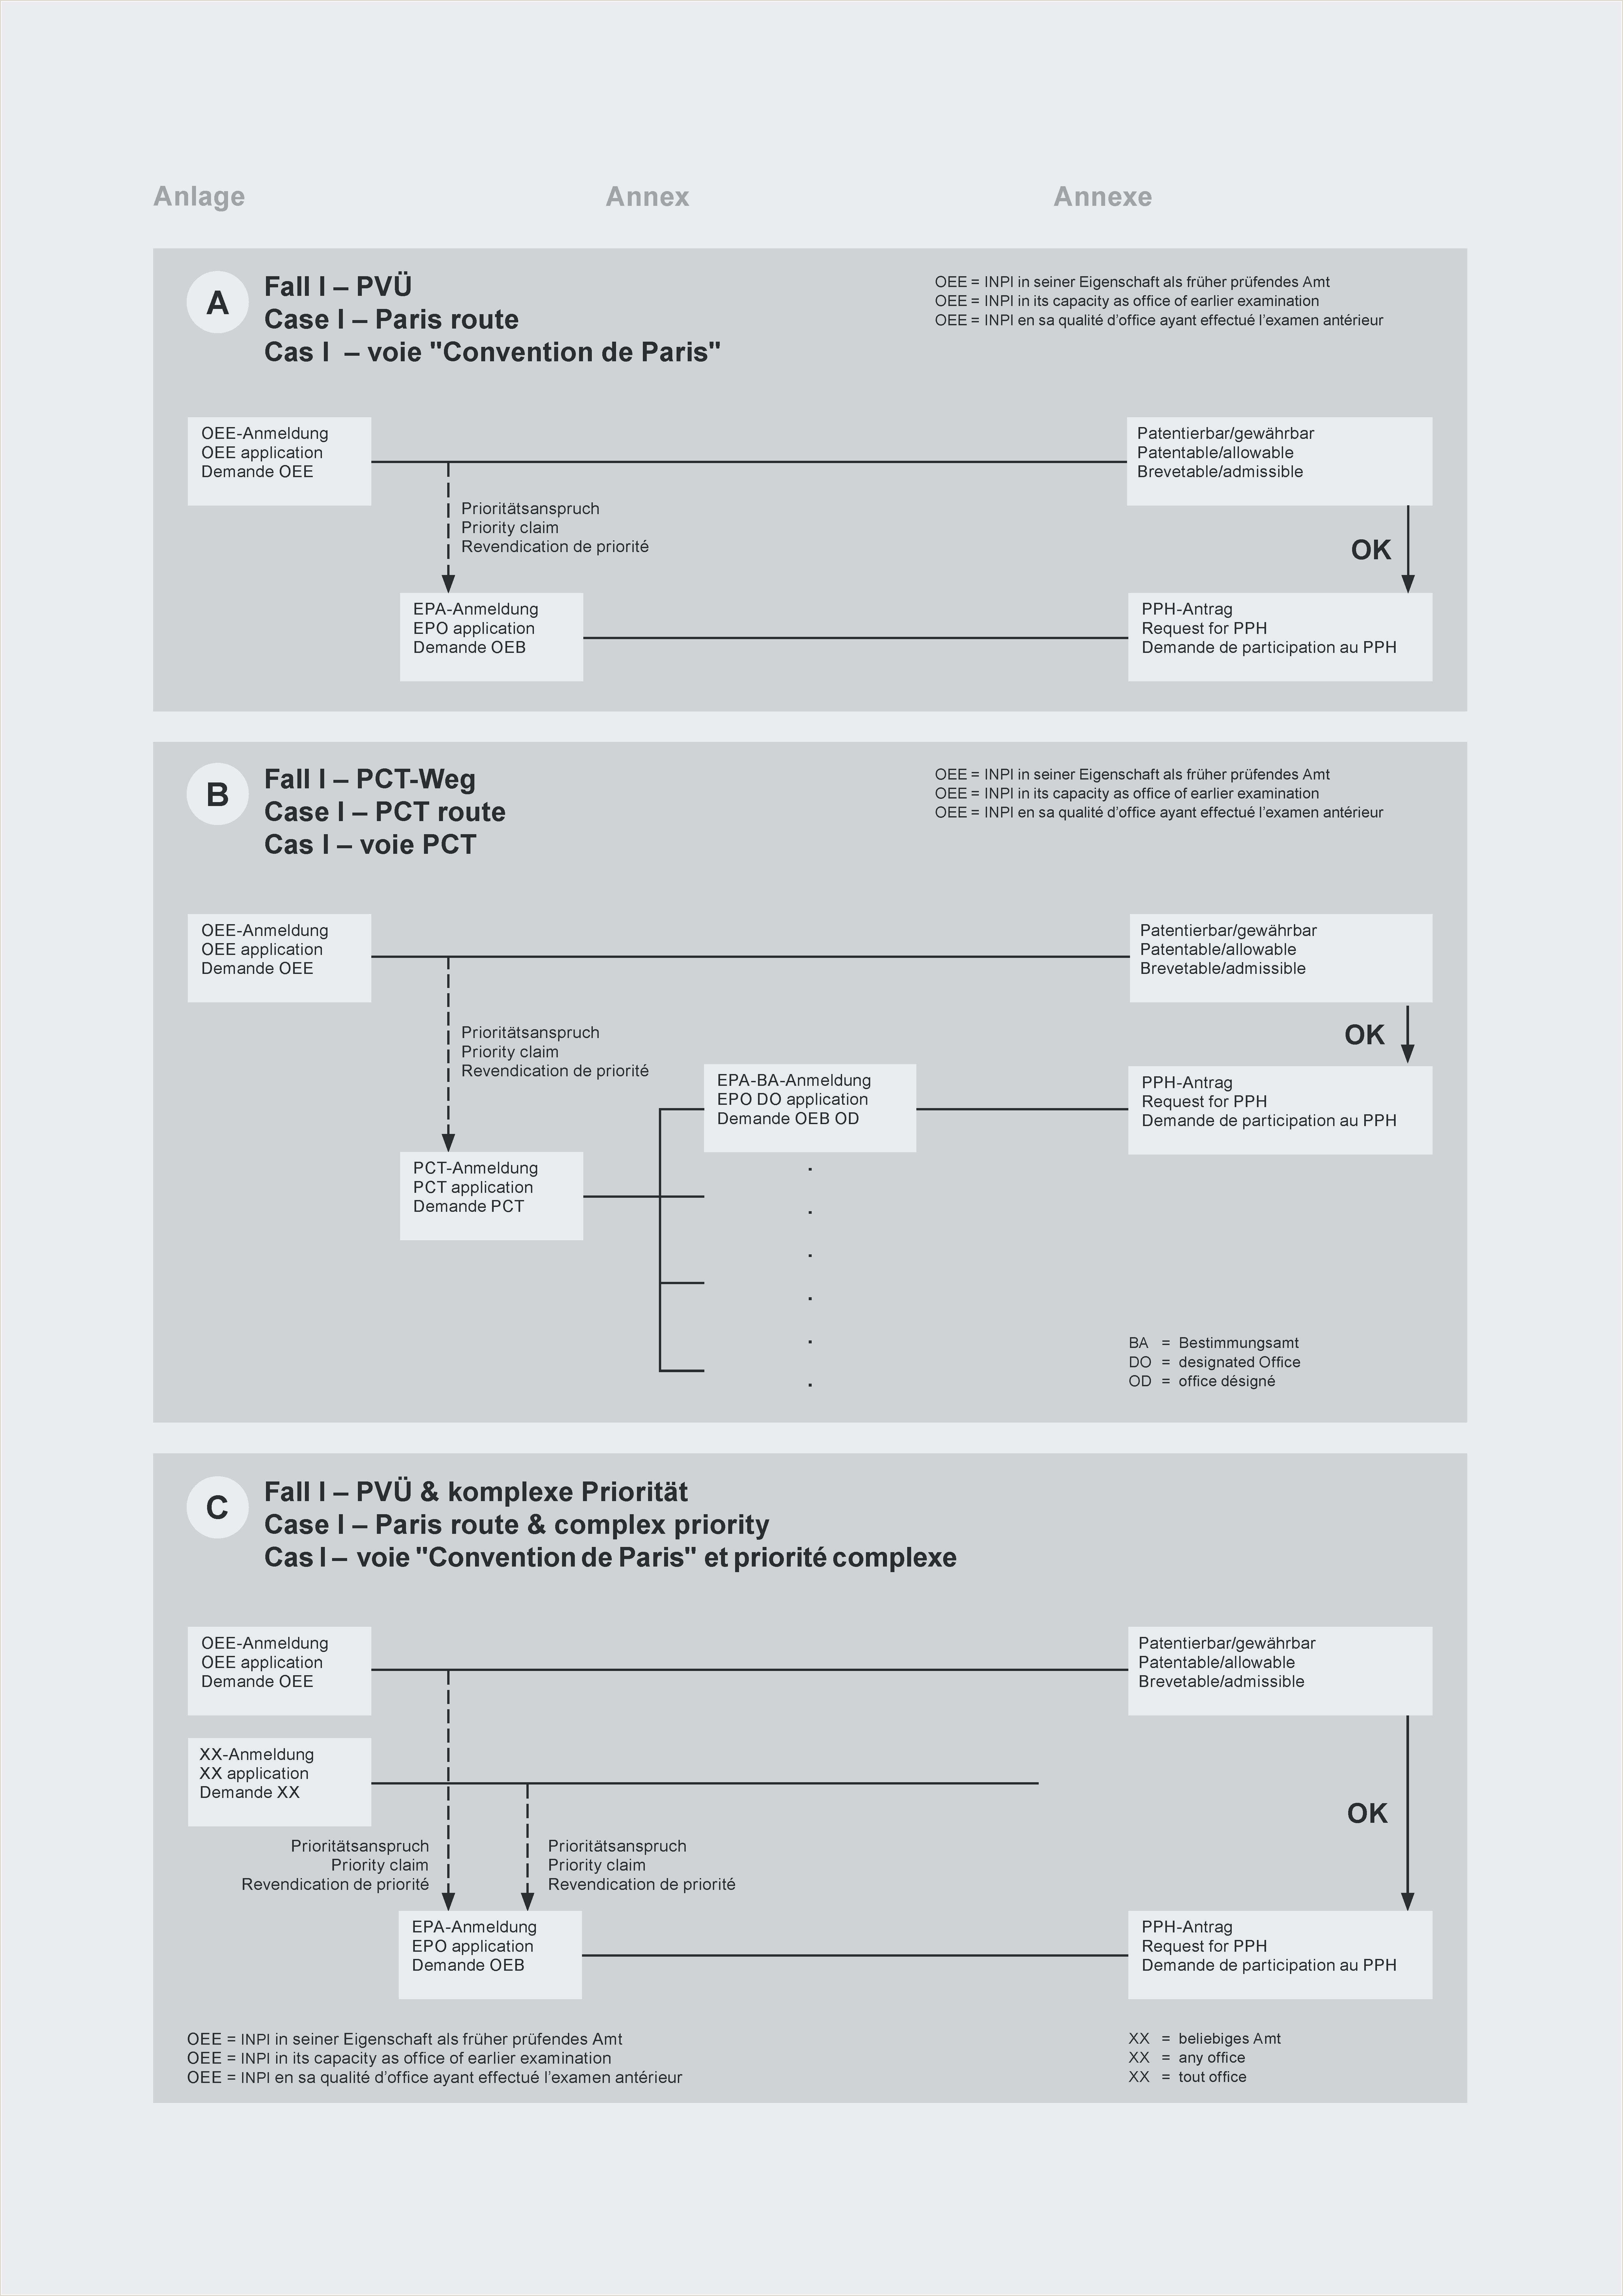 Resume format for Job Letter Luxe Fresh Graduate Resume format Download Sample Cover